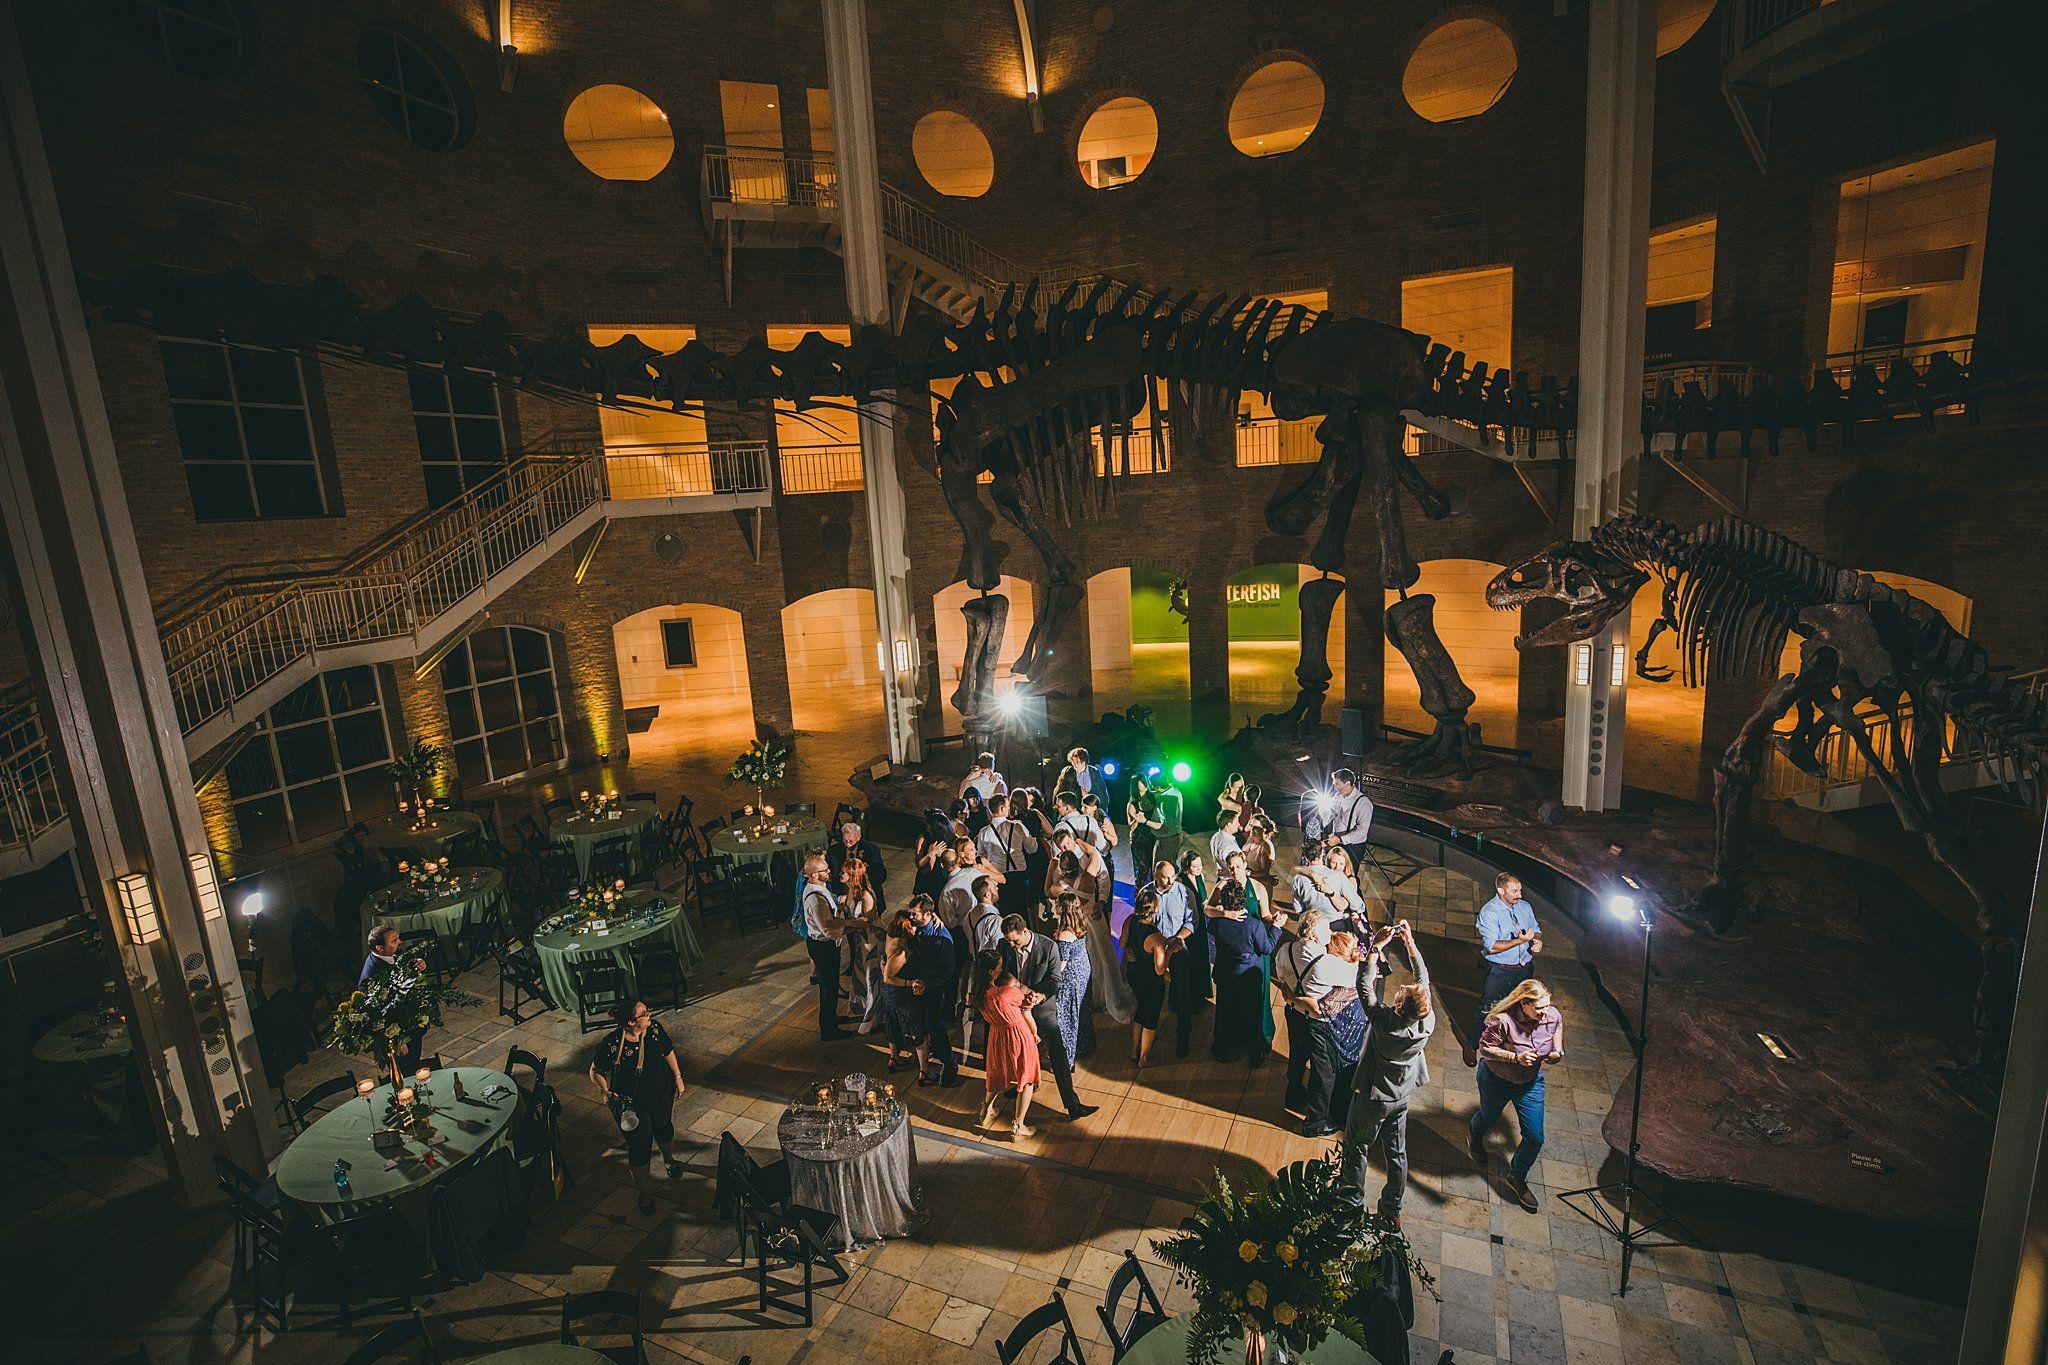 Fernbank Museum Of Natural History Wedding Reception In 2020 Atlanta Wedding Atlanta Wedding Photographer Atlanta Wedding Reception